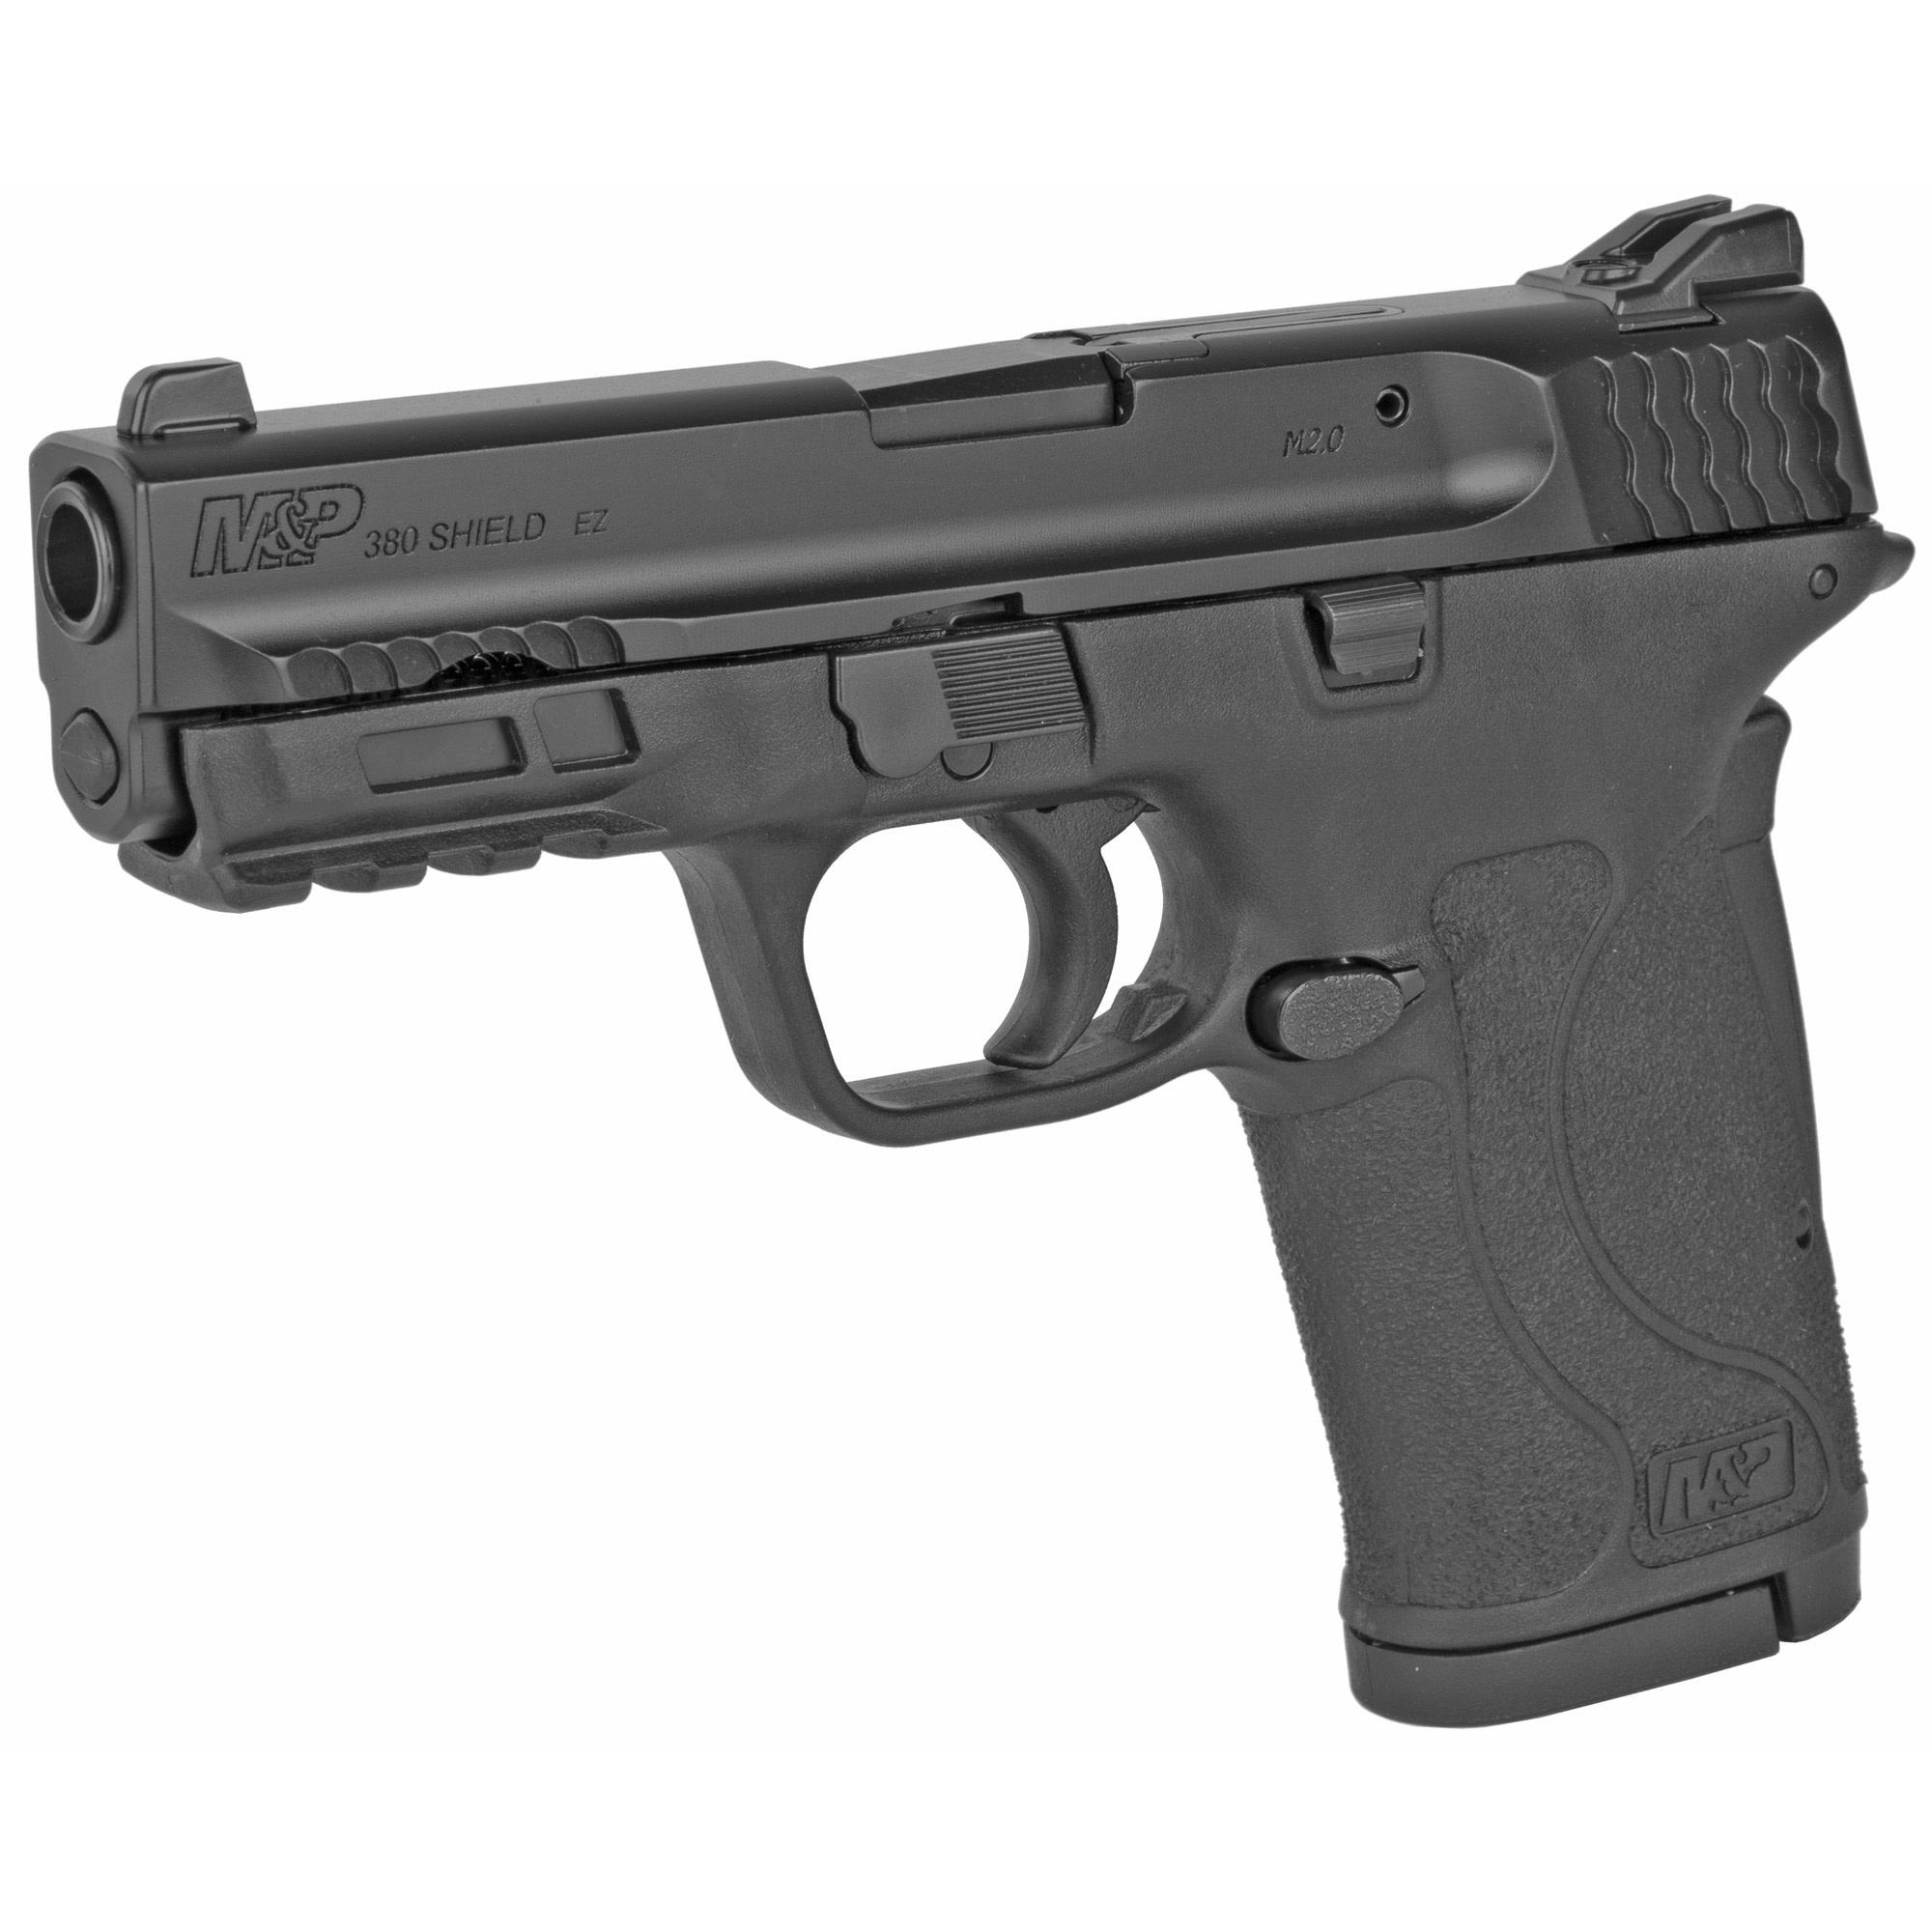 Smith & Wesson M&P 380 Shield EZ M2.0, 380 ACP